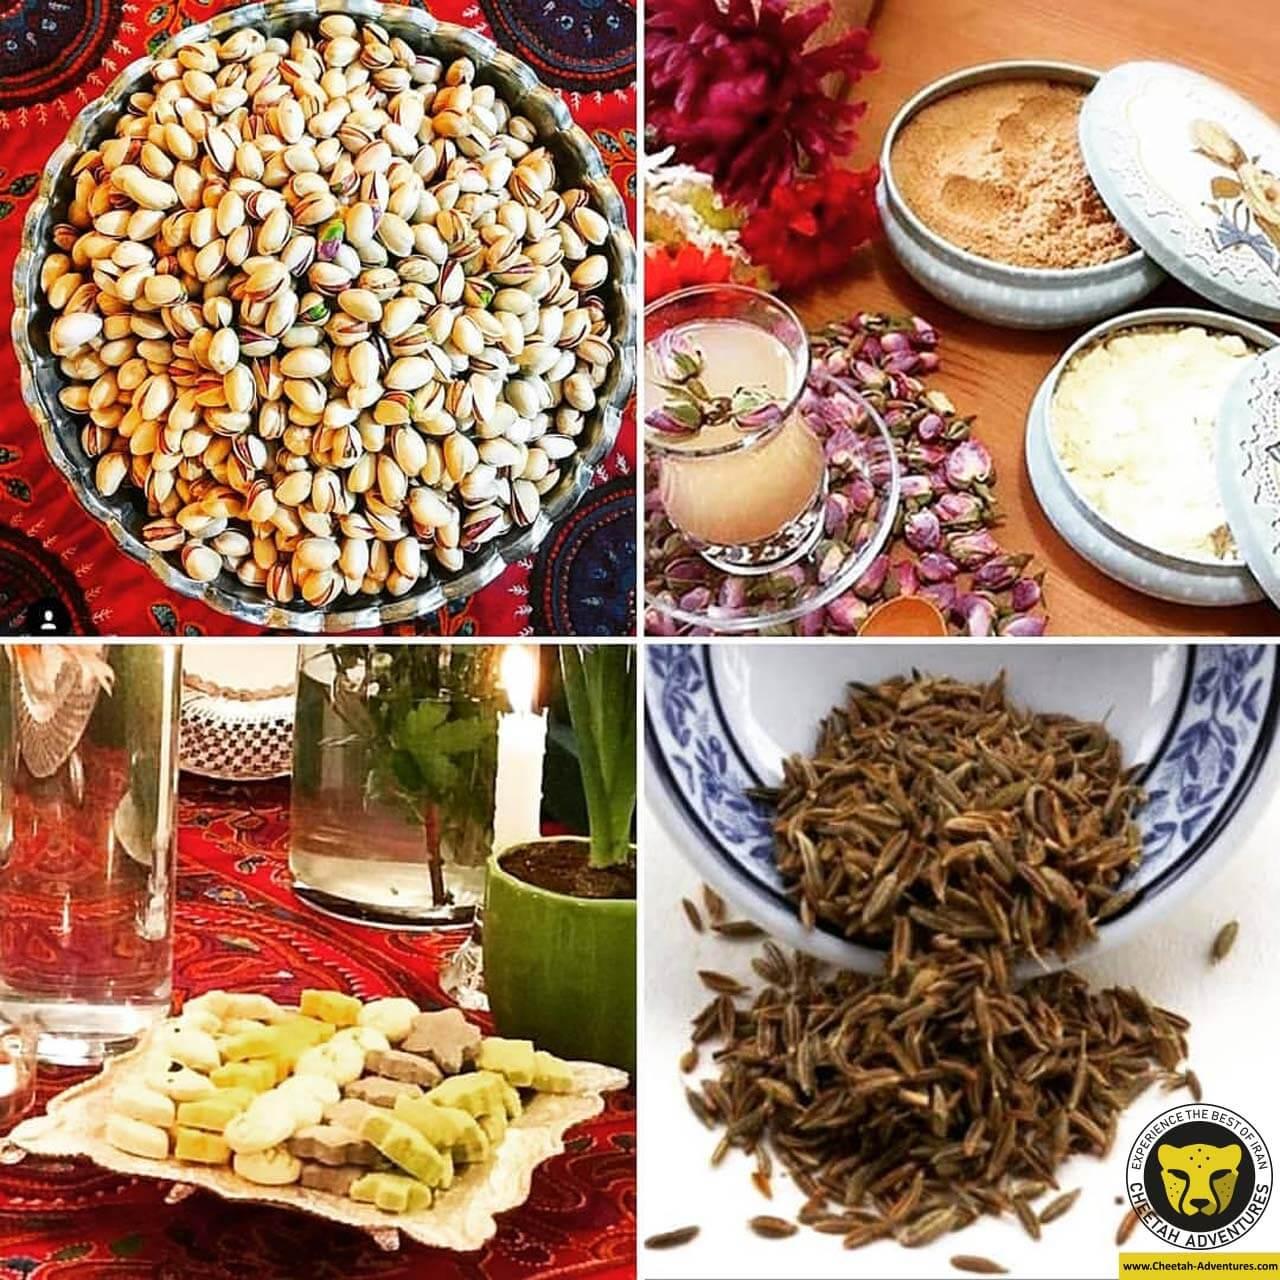 Souvenirs kerman travel guide iran tour package Cheetah adventures